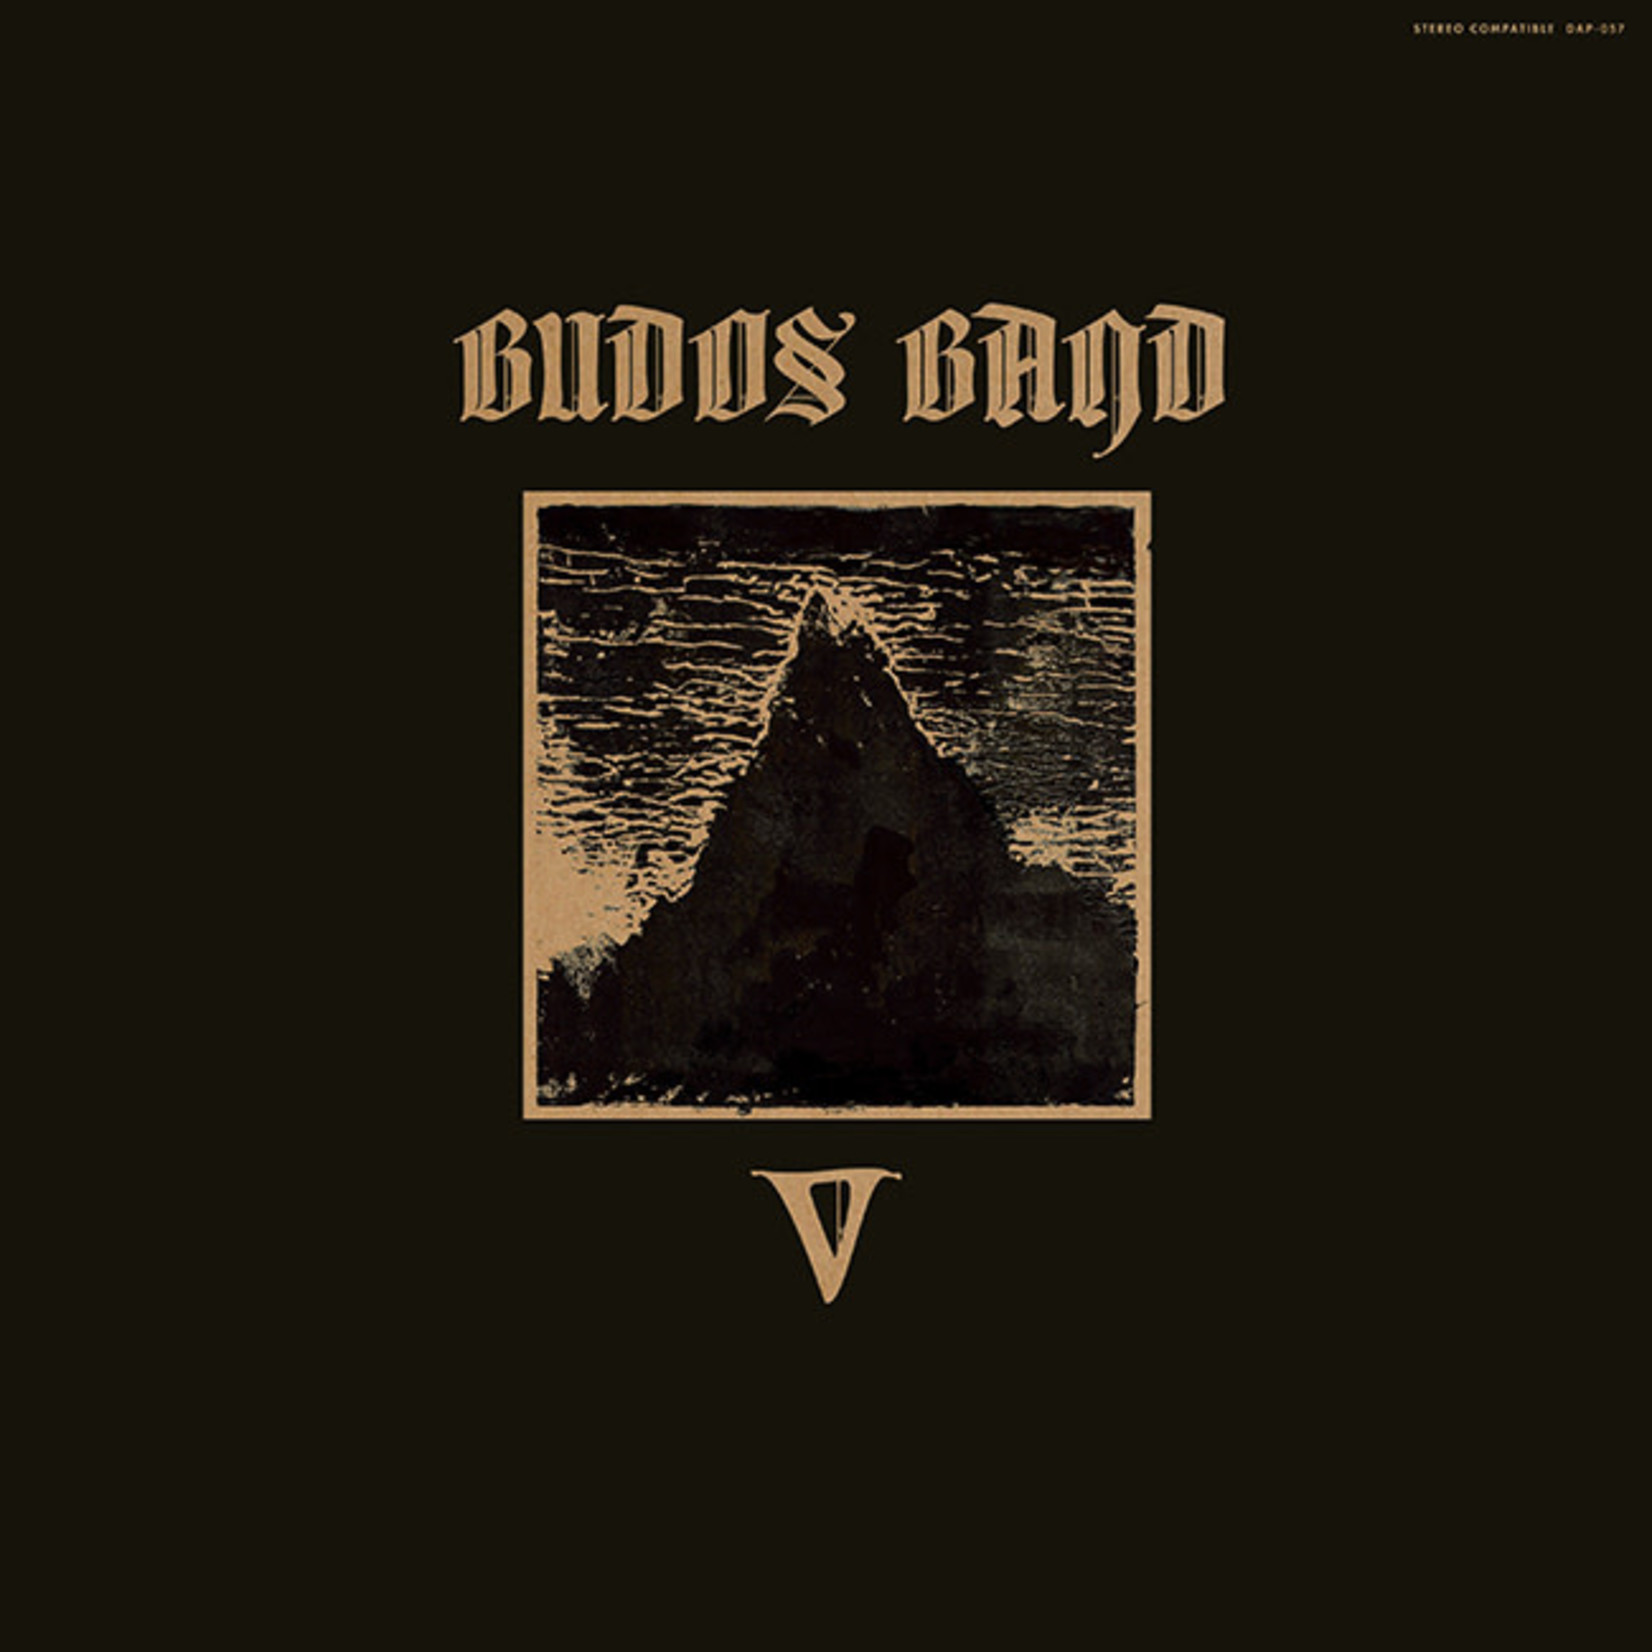 [New] Budos Band: V